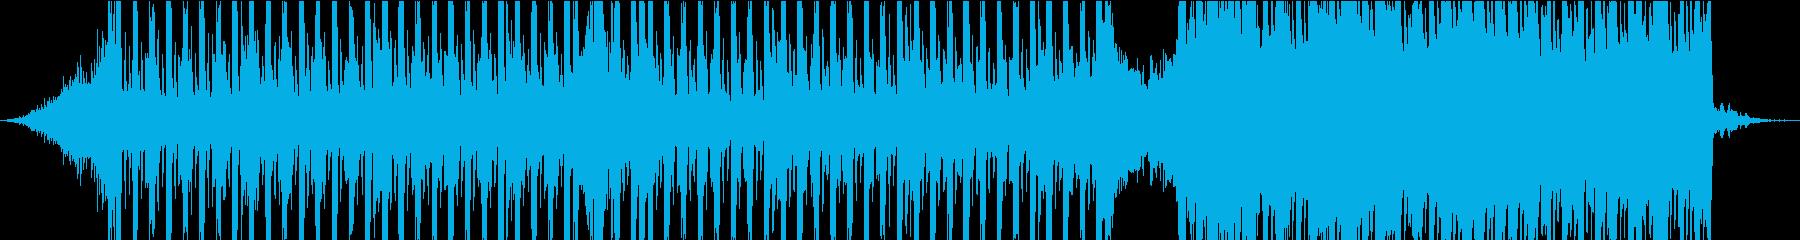 CMプロモーション用のBGMですの再生済みの波形